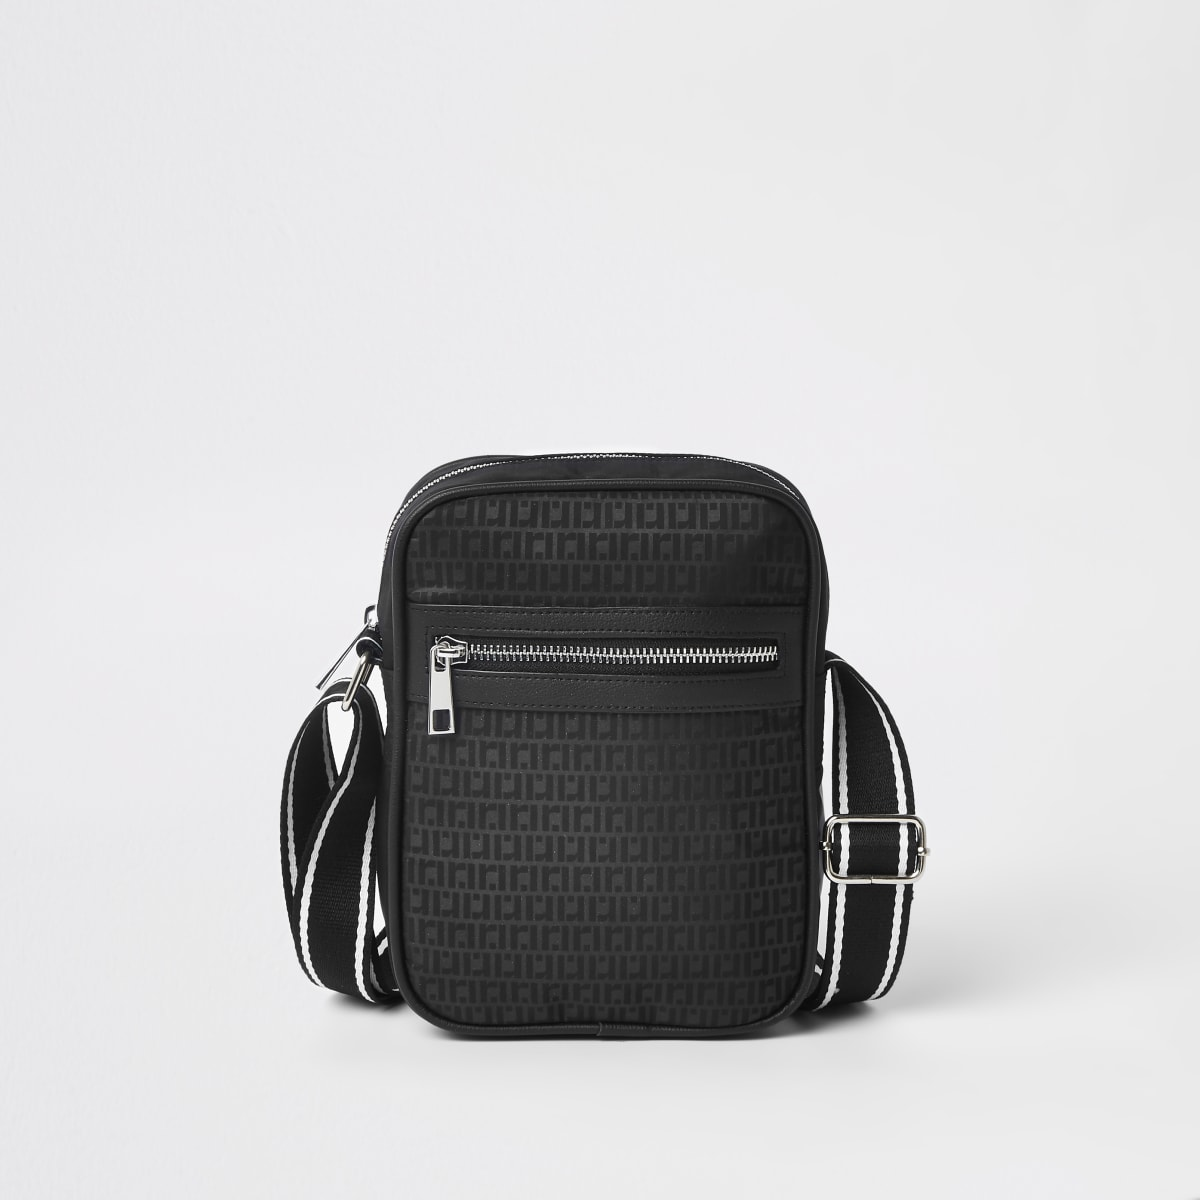 81bae2e9347 Zwarte schoudertas met RI-monogram - Crossbodytassen - Tassen - Heren